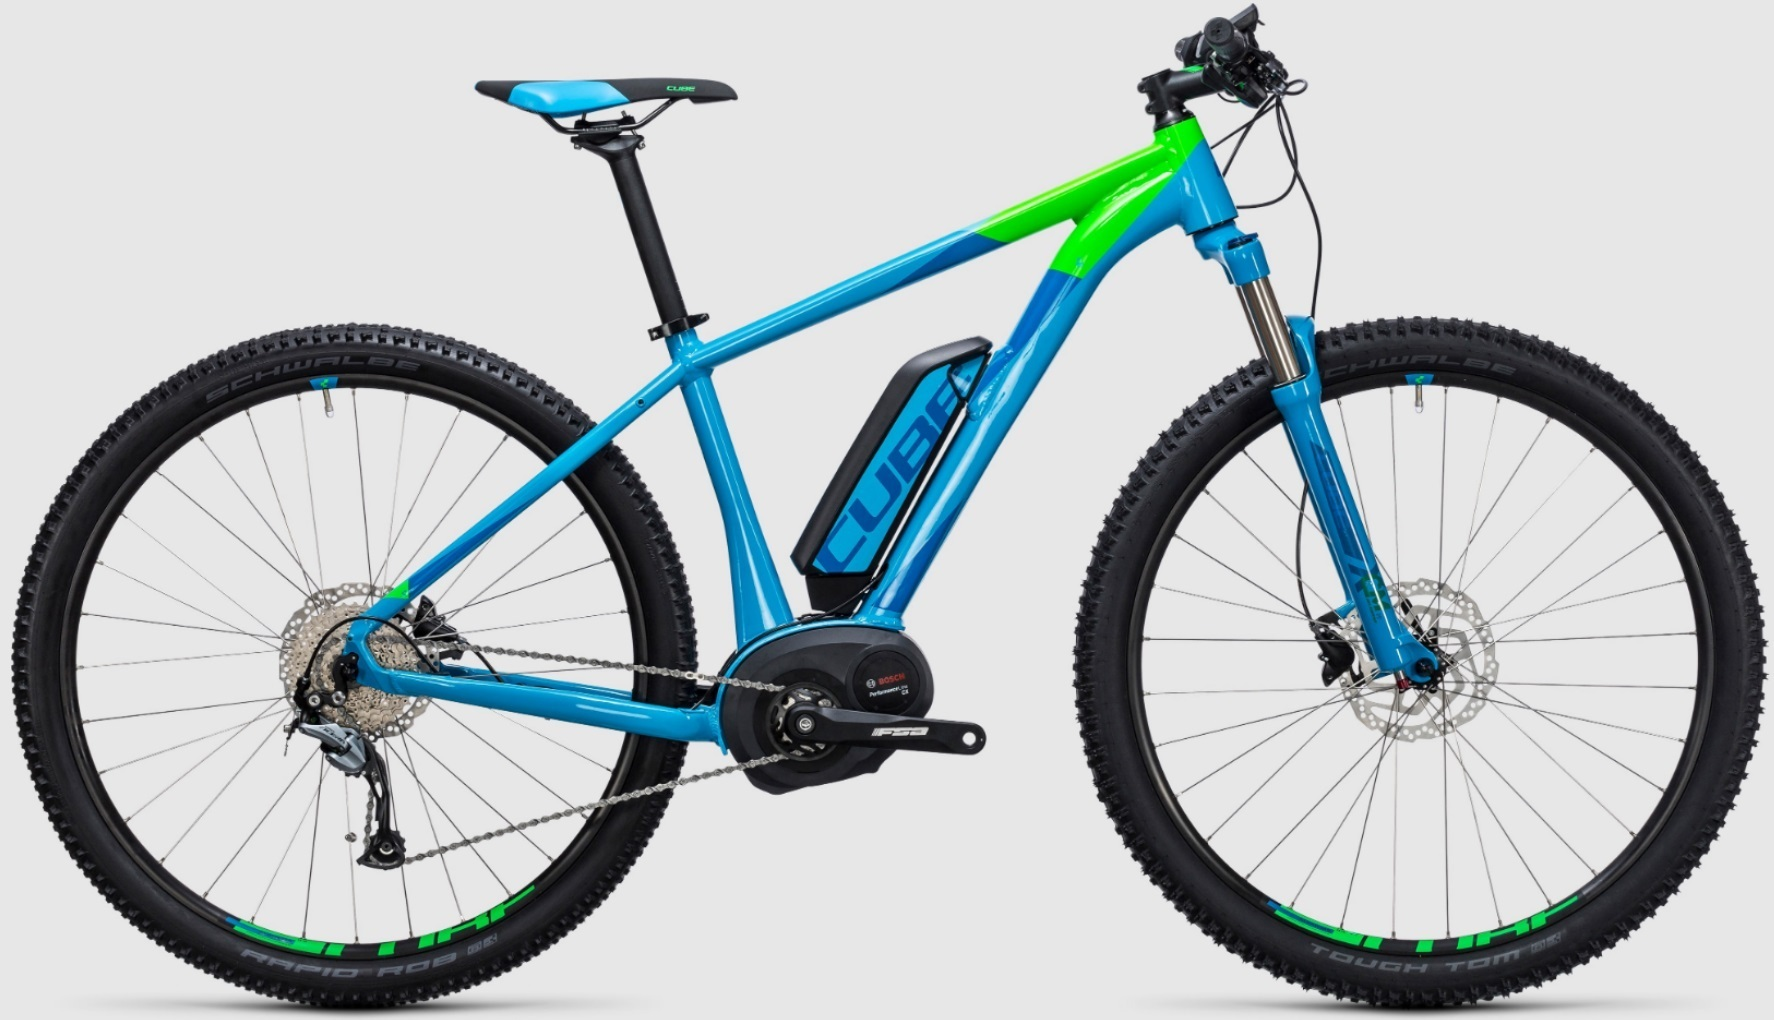 cube reaction hybrid one 400wh 29r elektro fahrrad ebike 2017. Black Bedroom Furniture Sets. Home Design Ideas